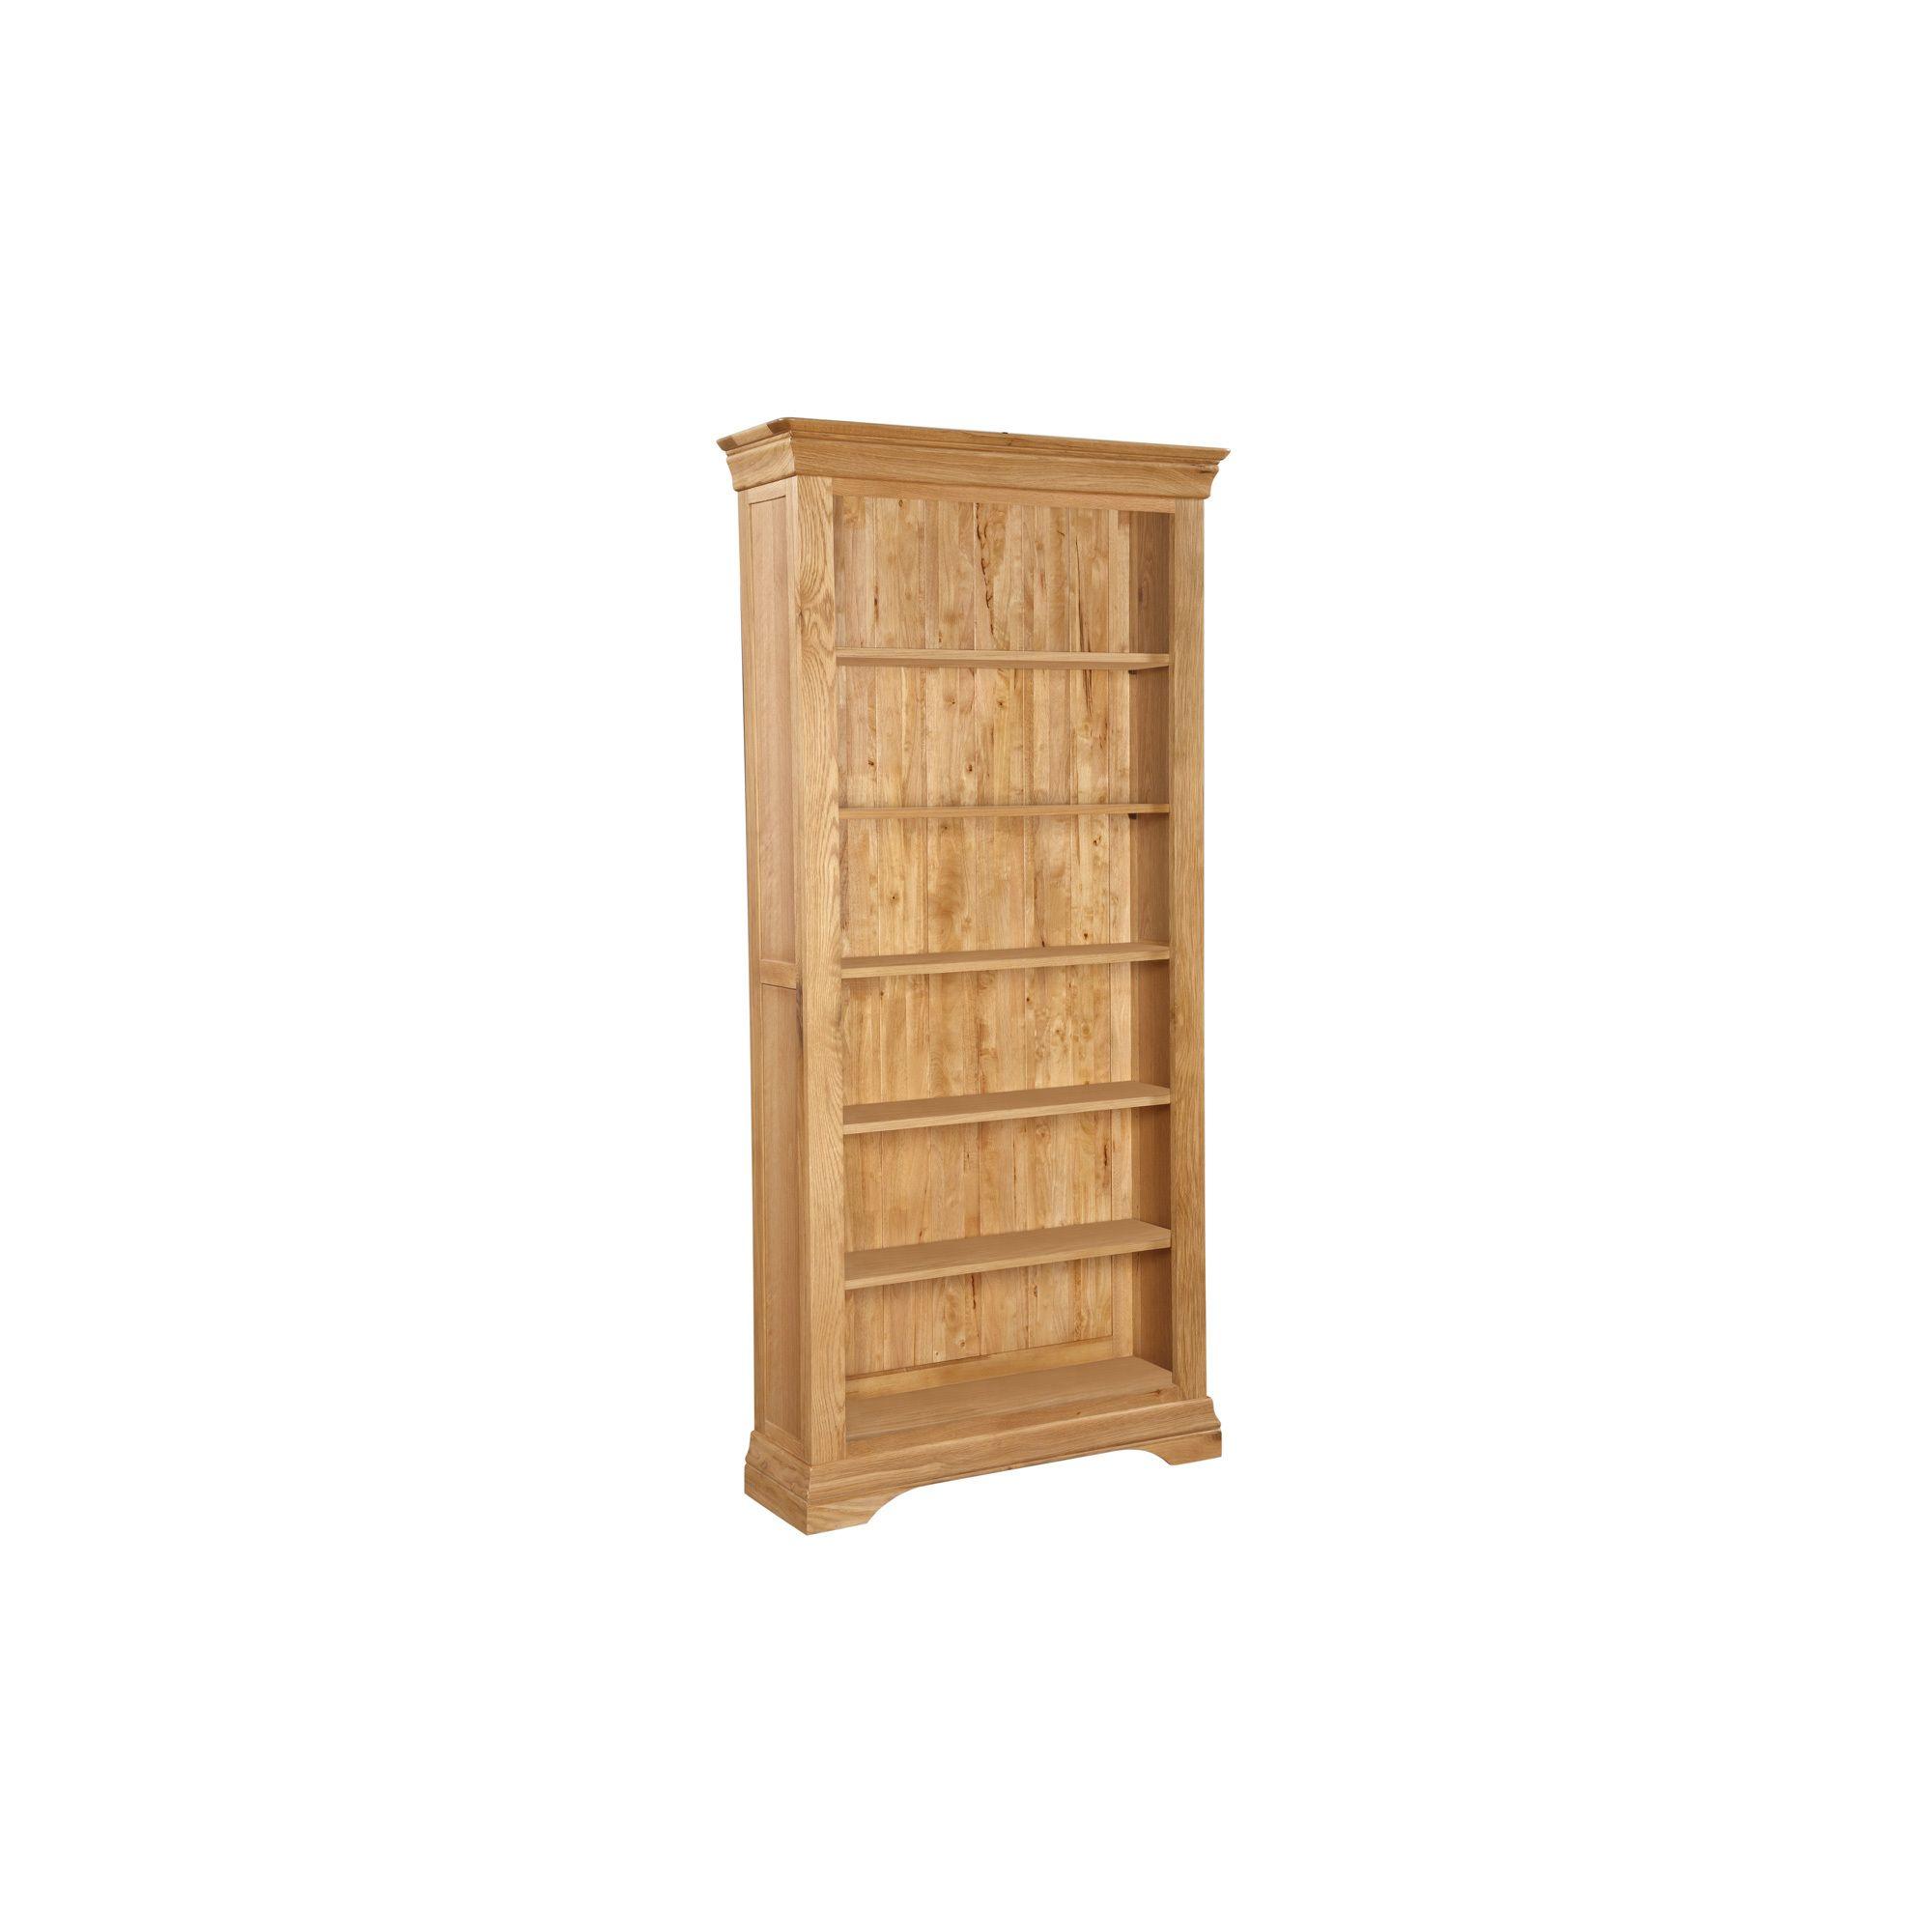 Elements Breton Large Bookcase at Tesco Direct